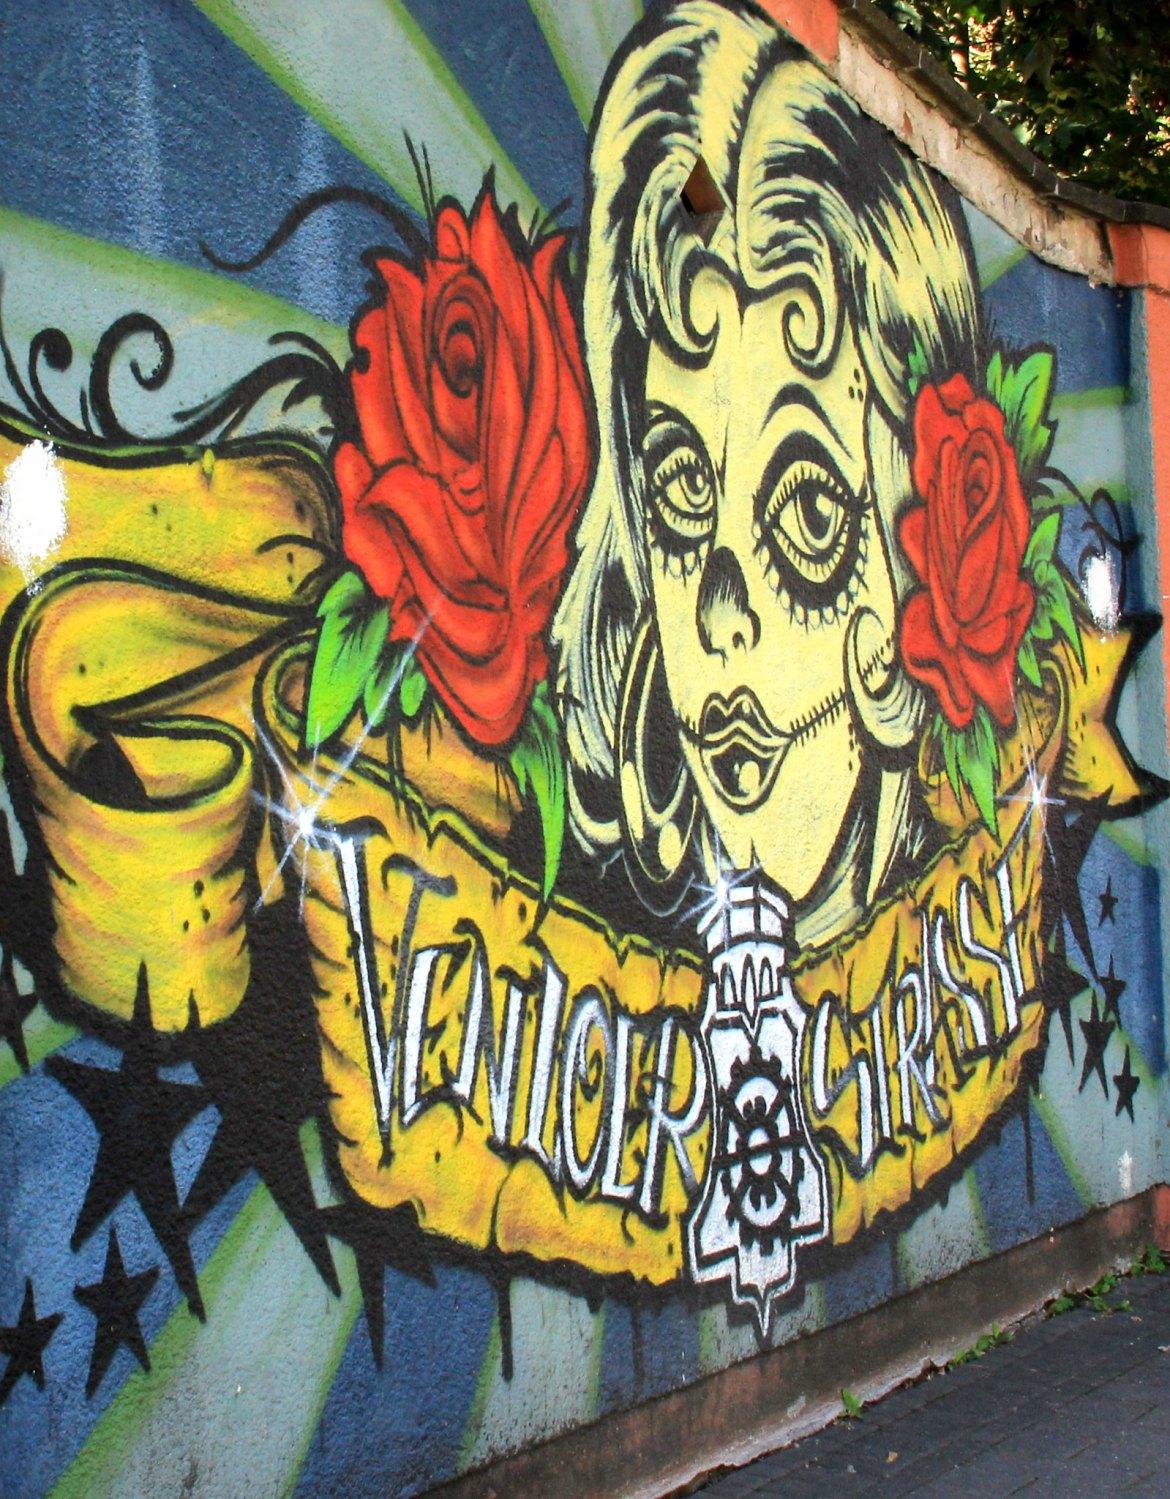 Pop art depicted in Cologne street art